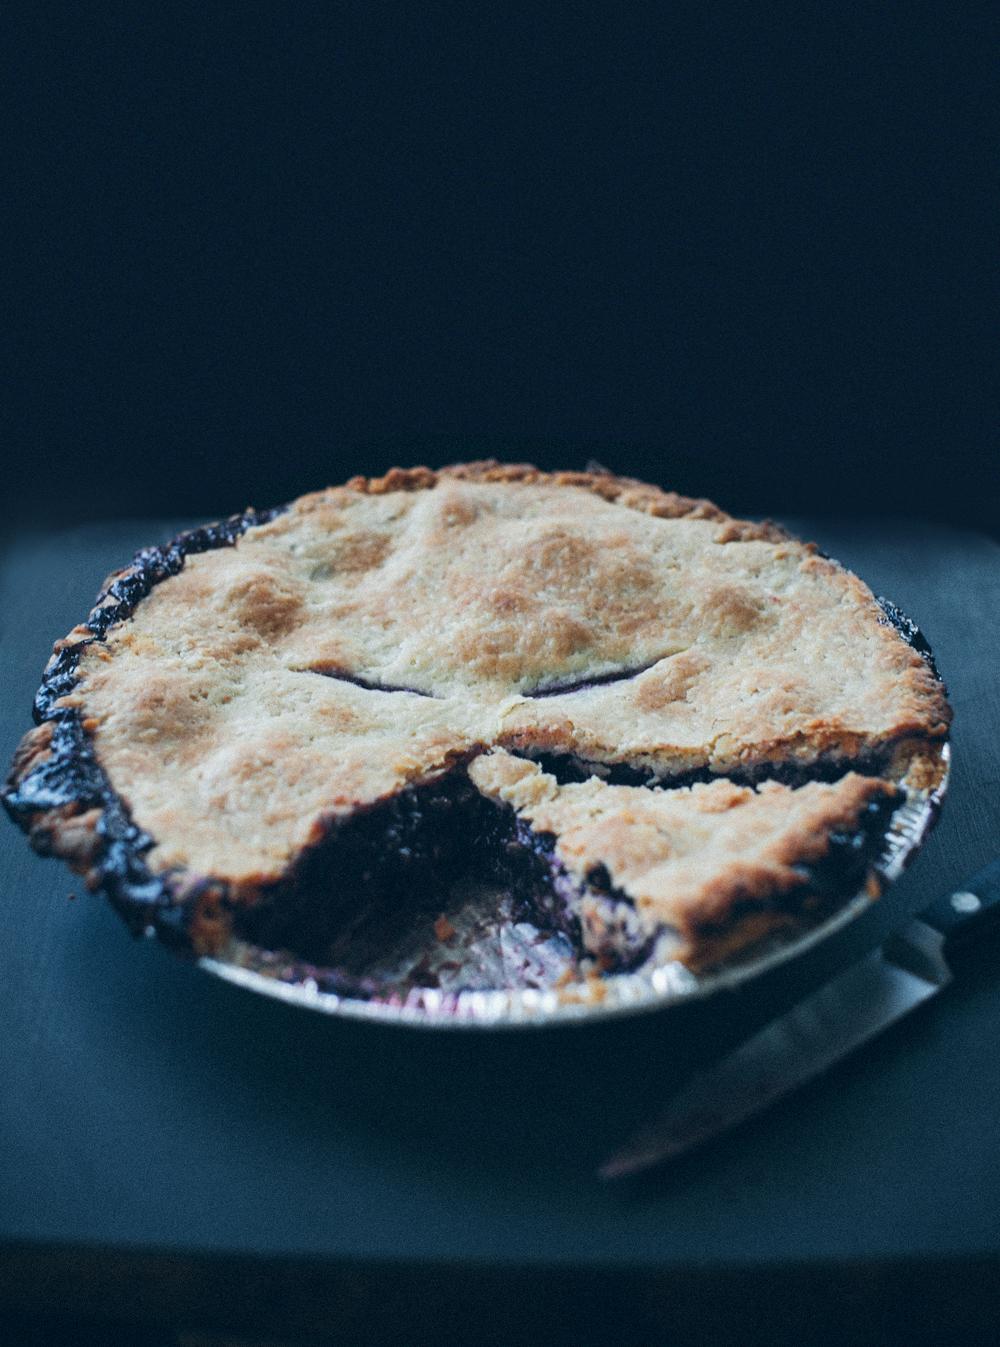 Black-berry-pie-9949.jpg